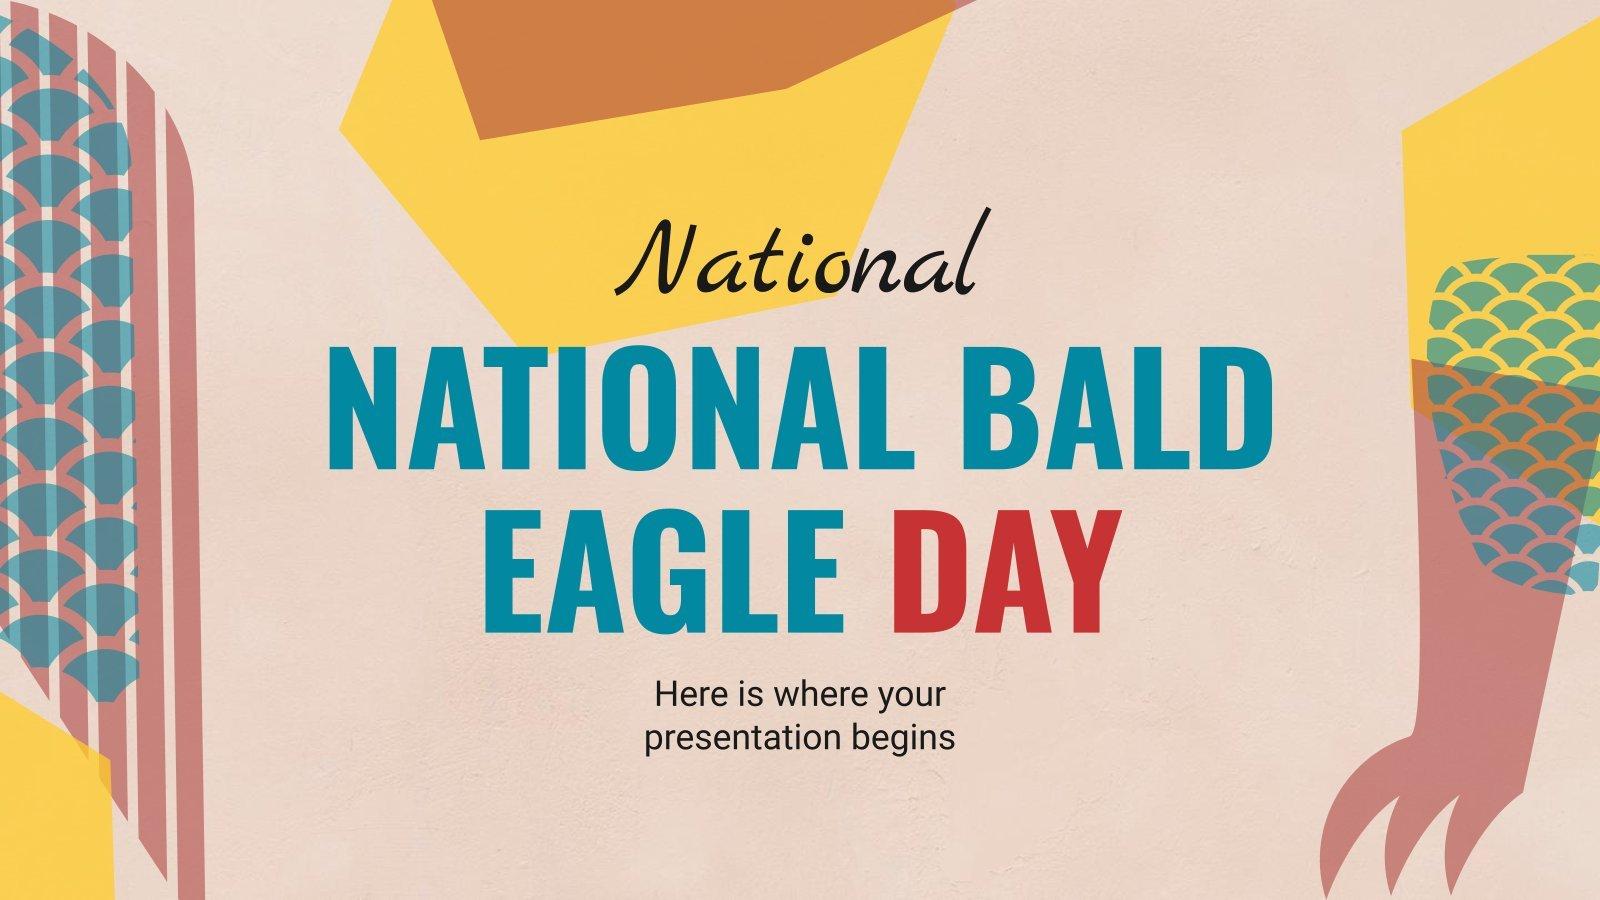 National Bald Eagle Day presentation template